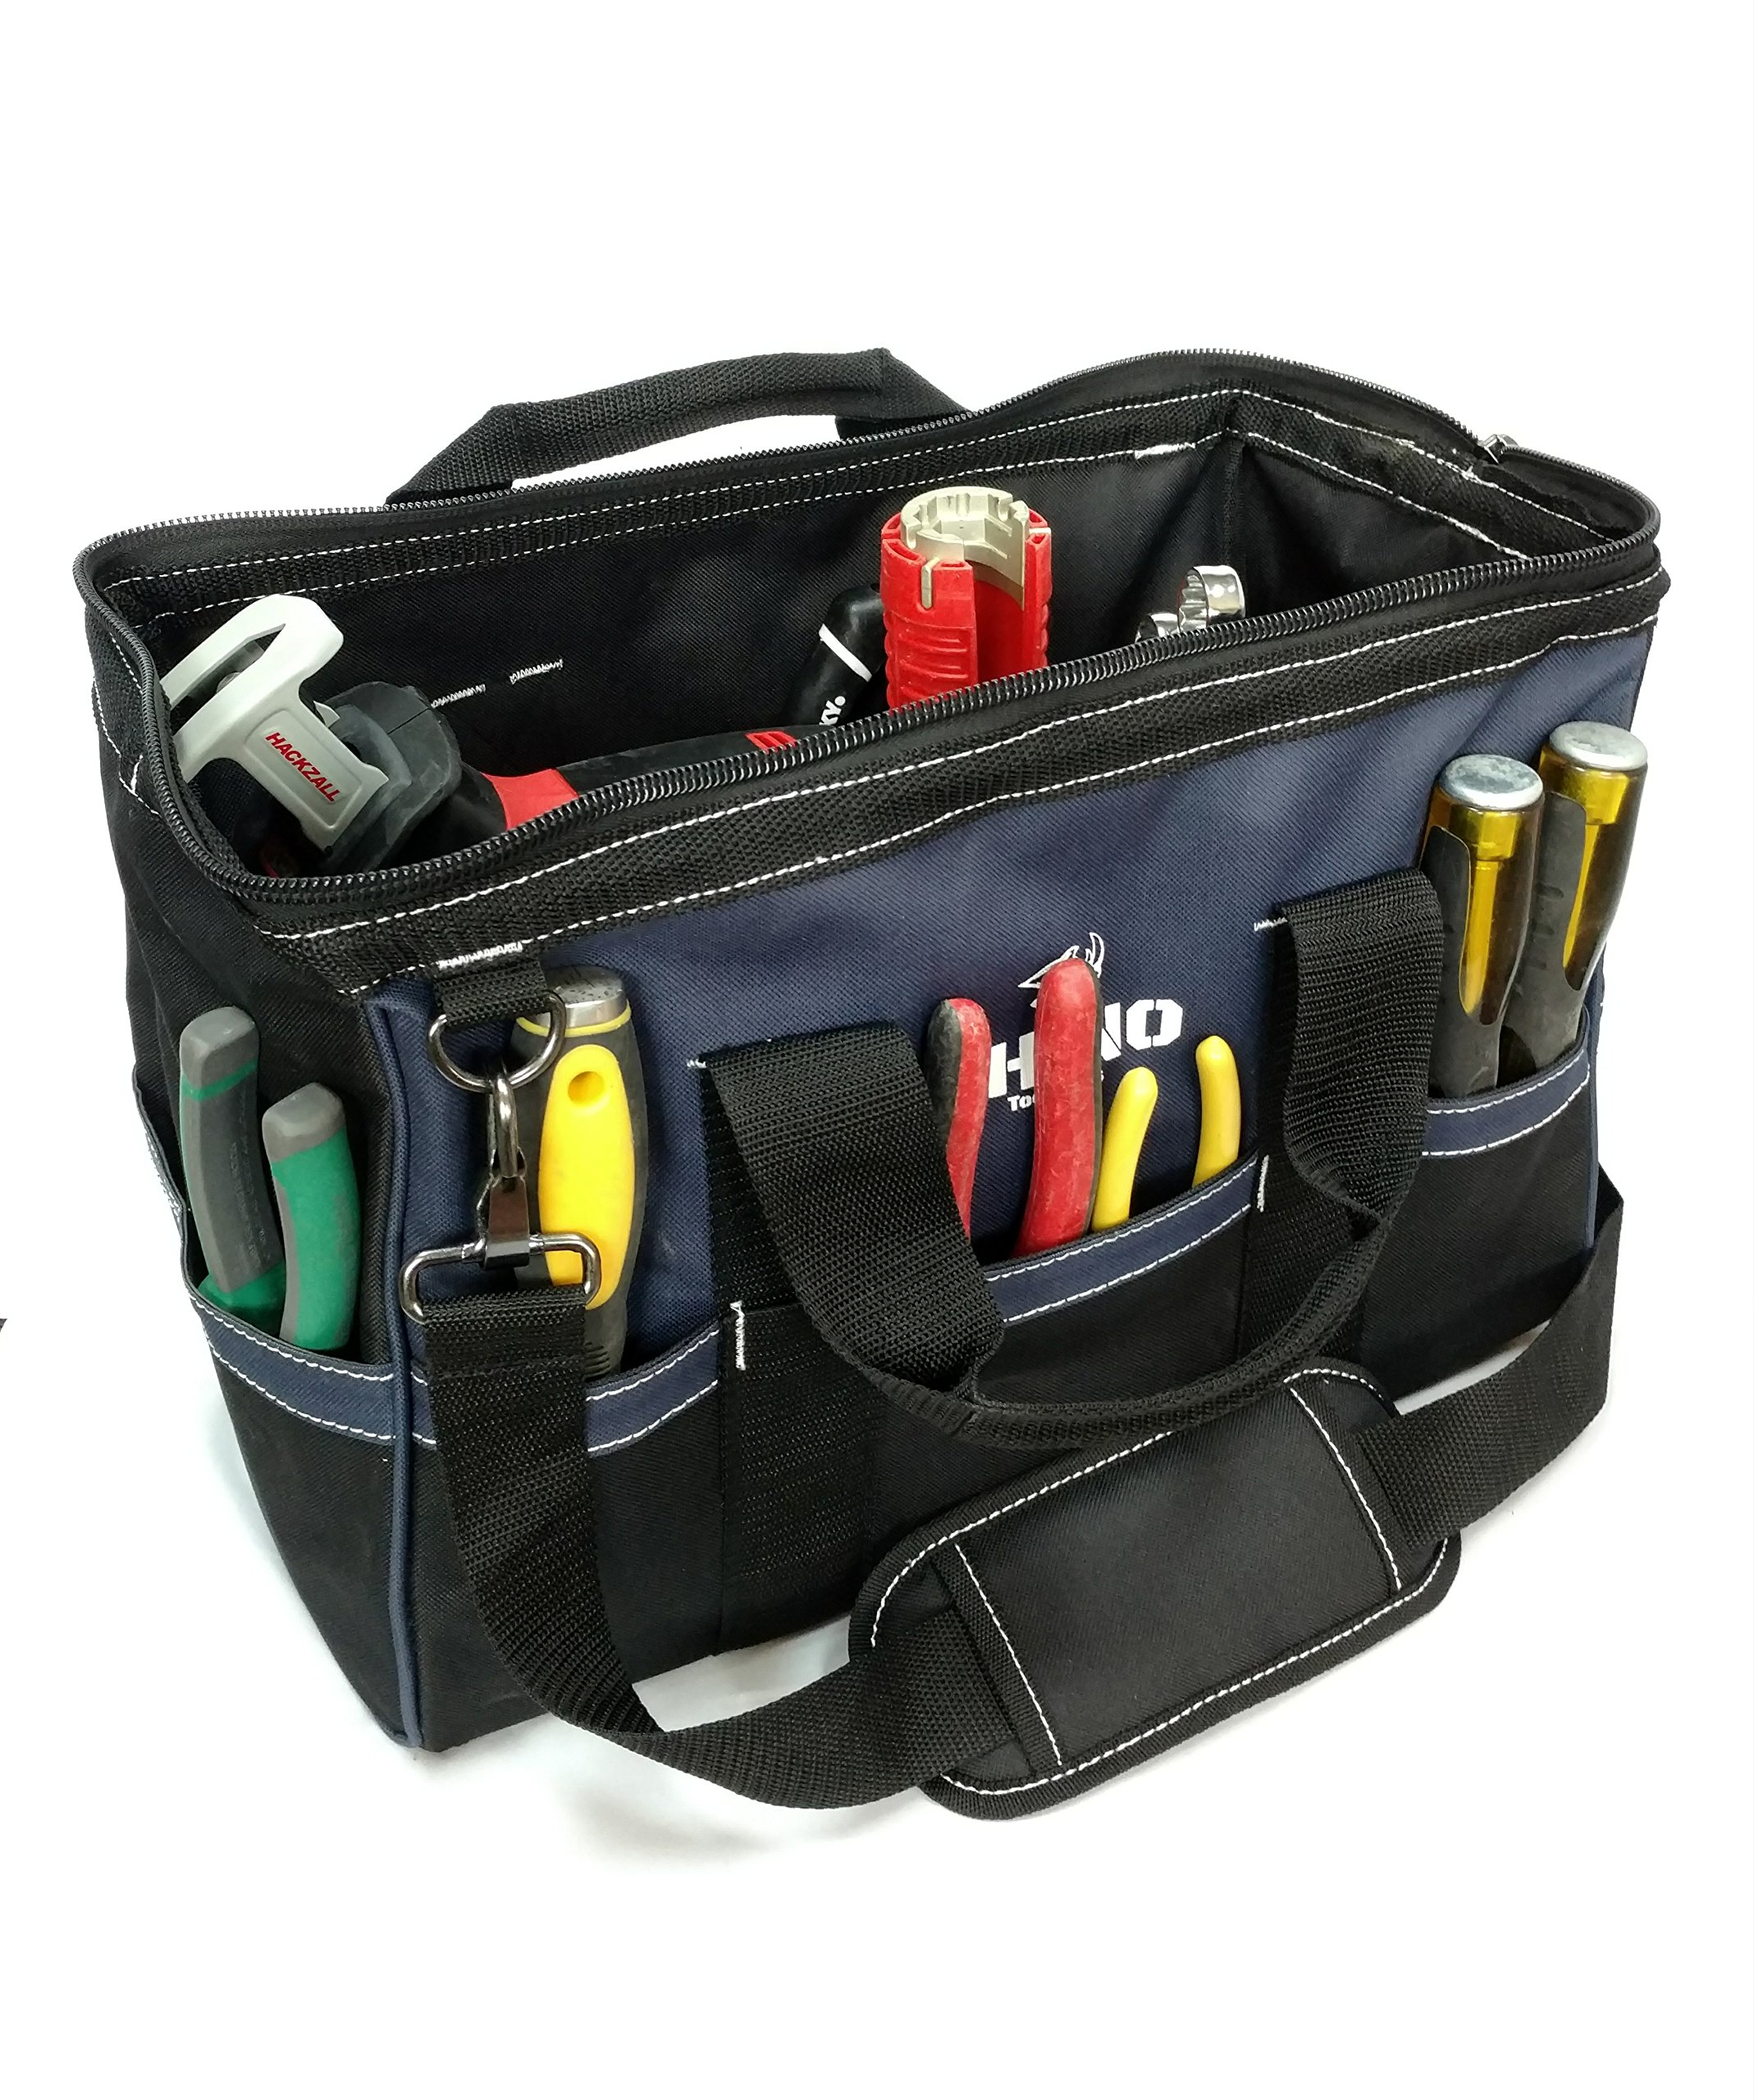 Rhino Contractor Tool Bag